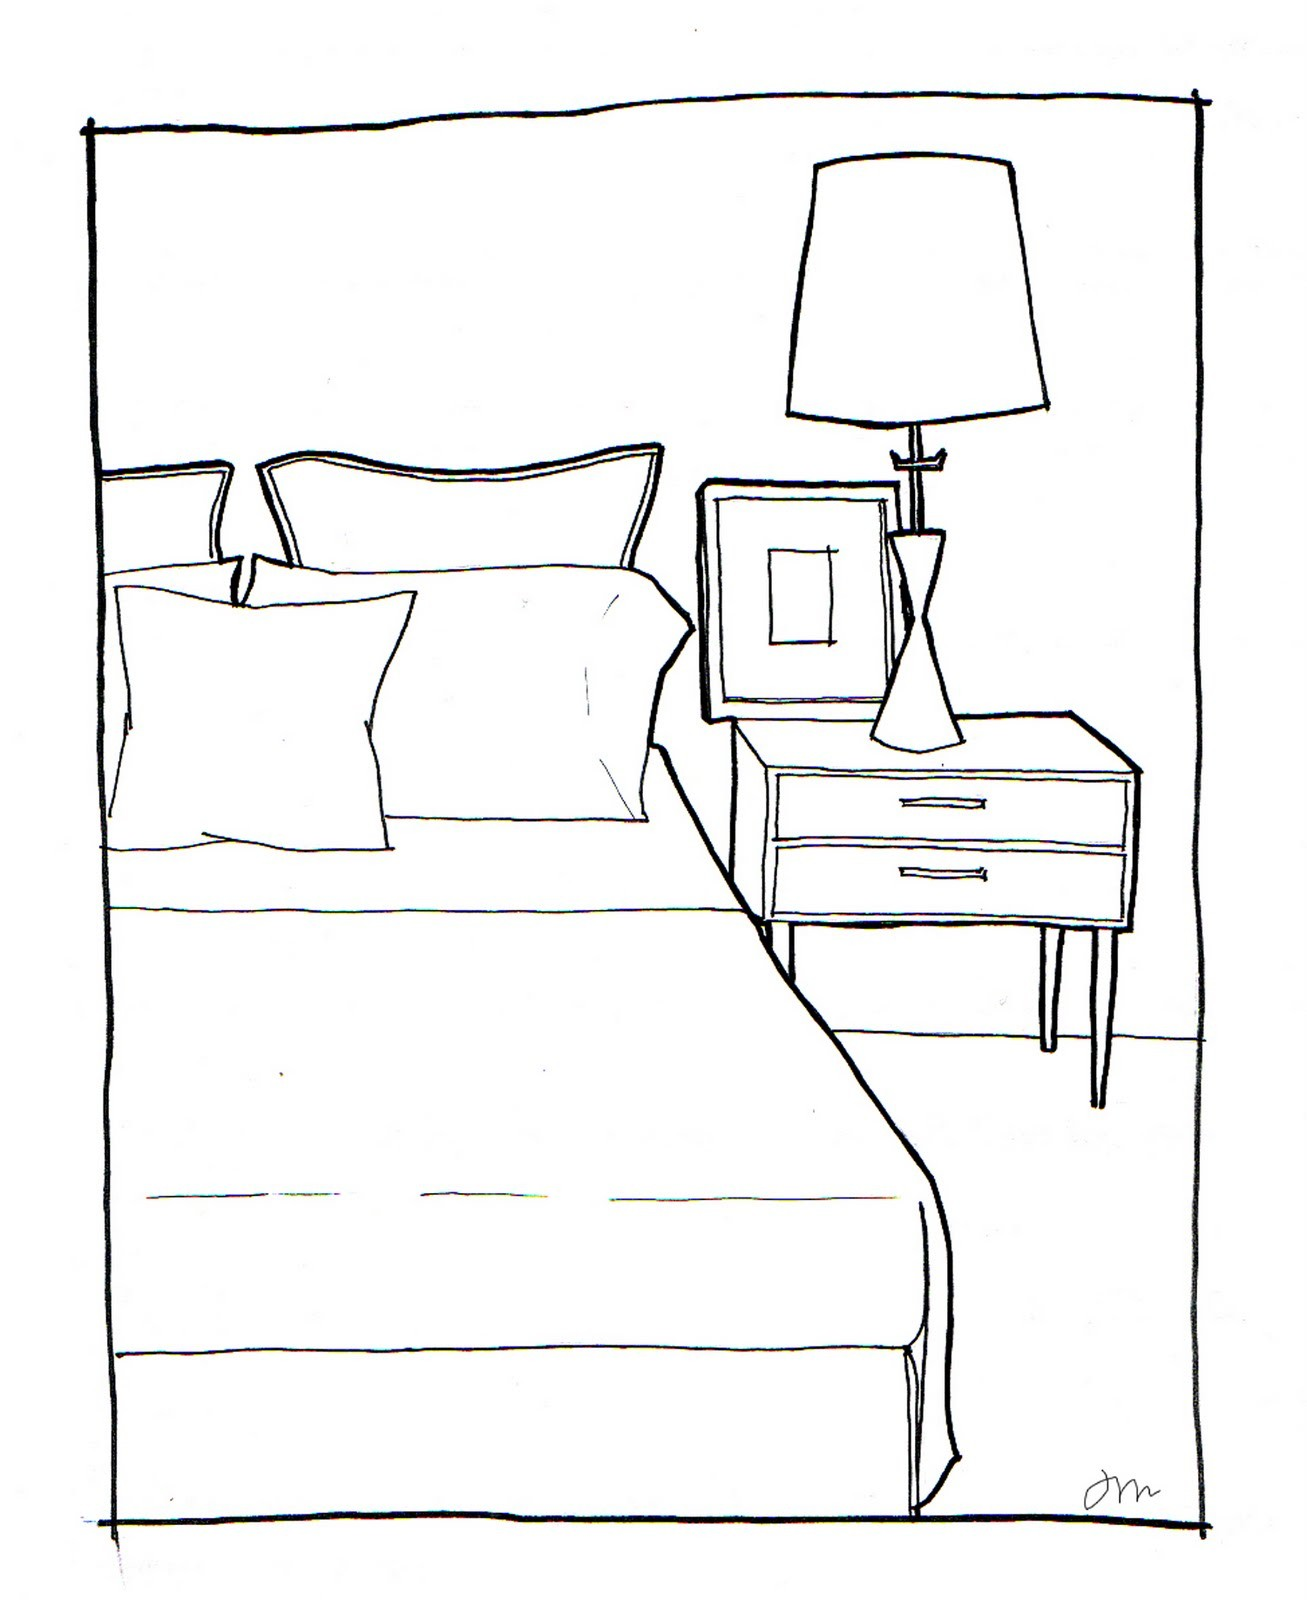 Drawn bedroom basic interior design #4